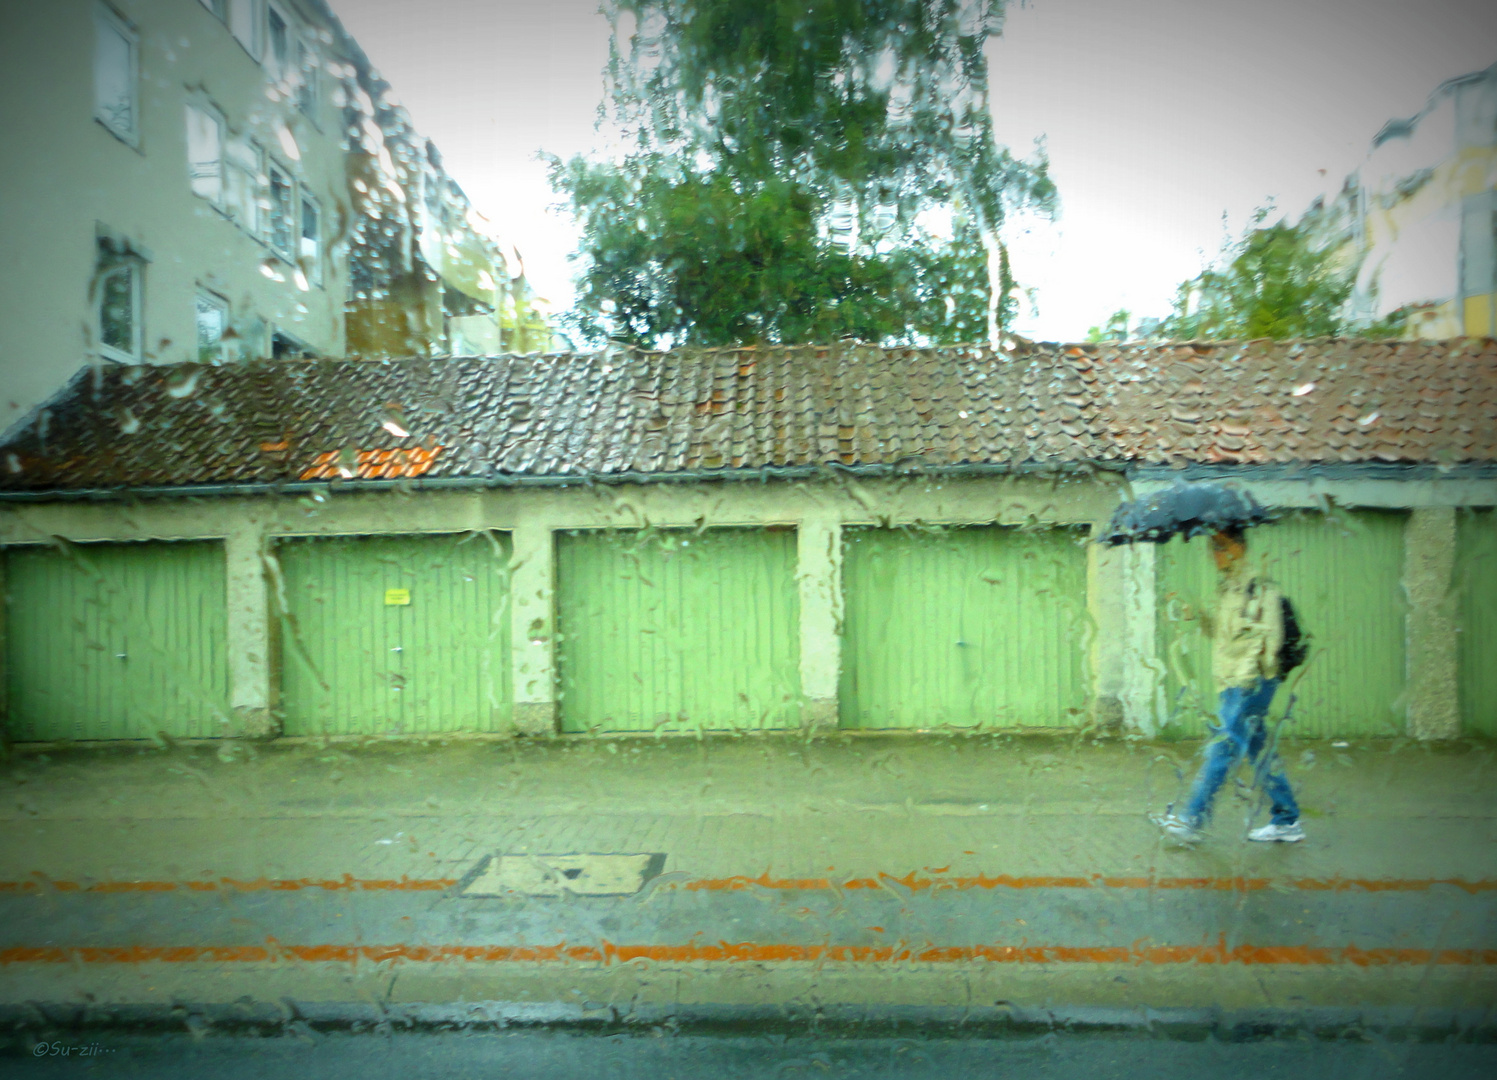 It's raining, man